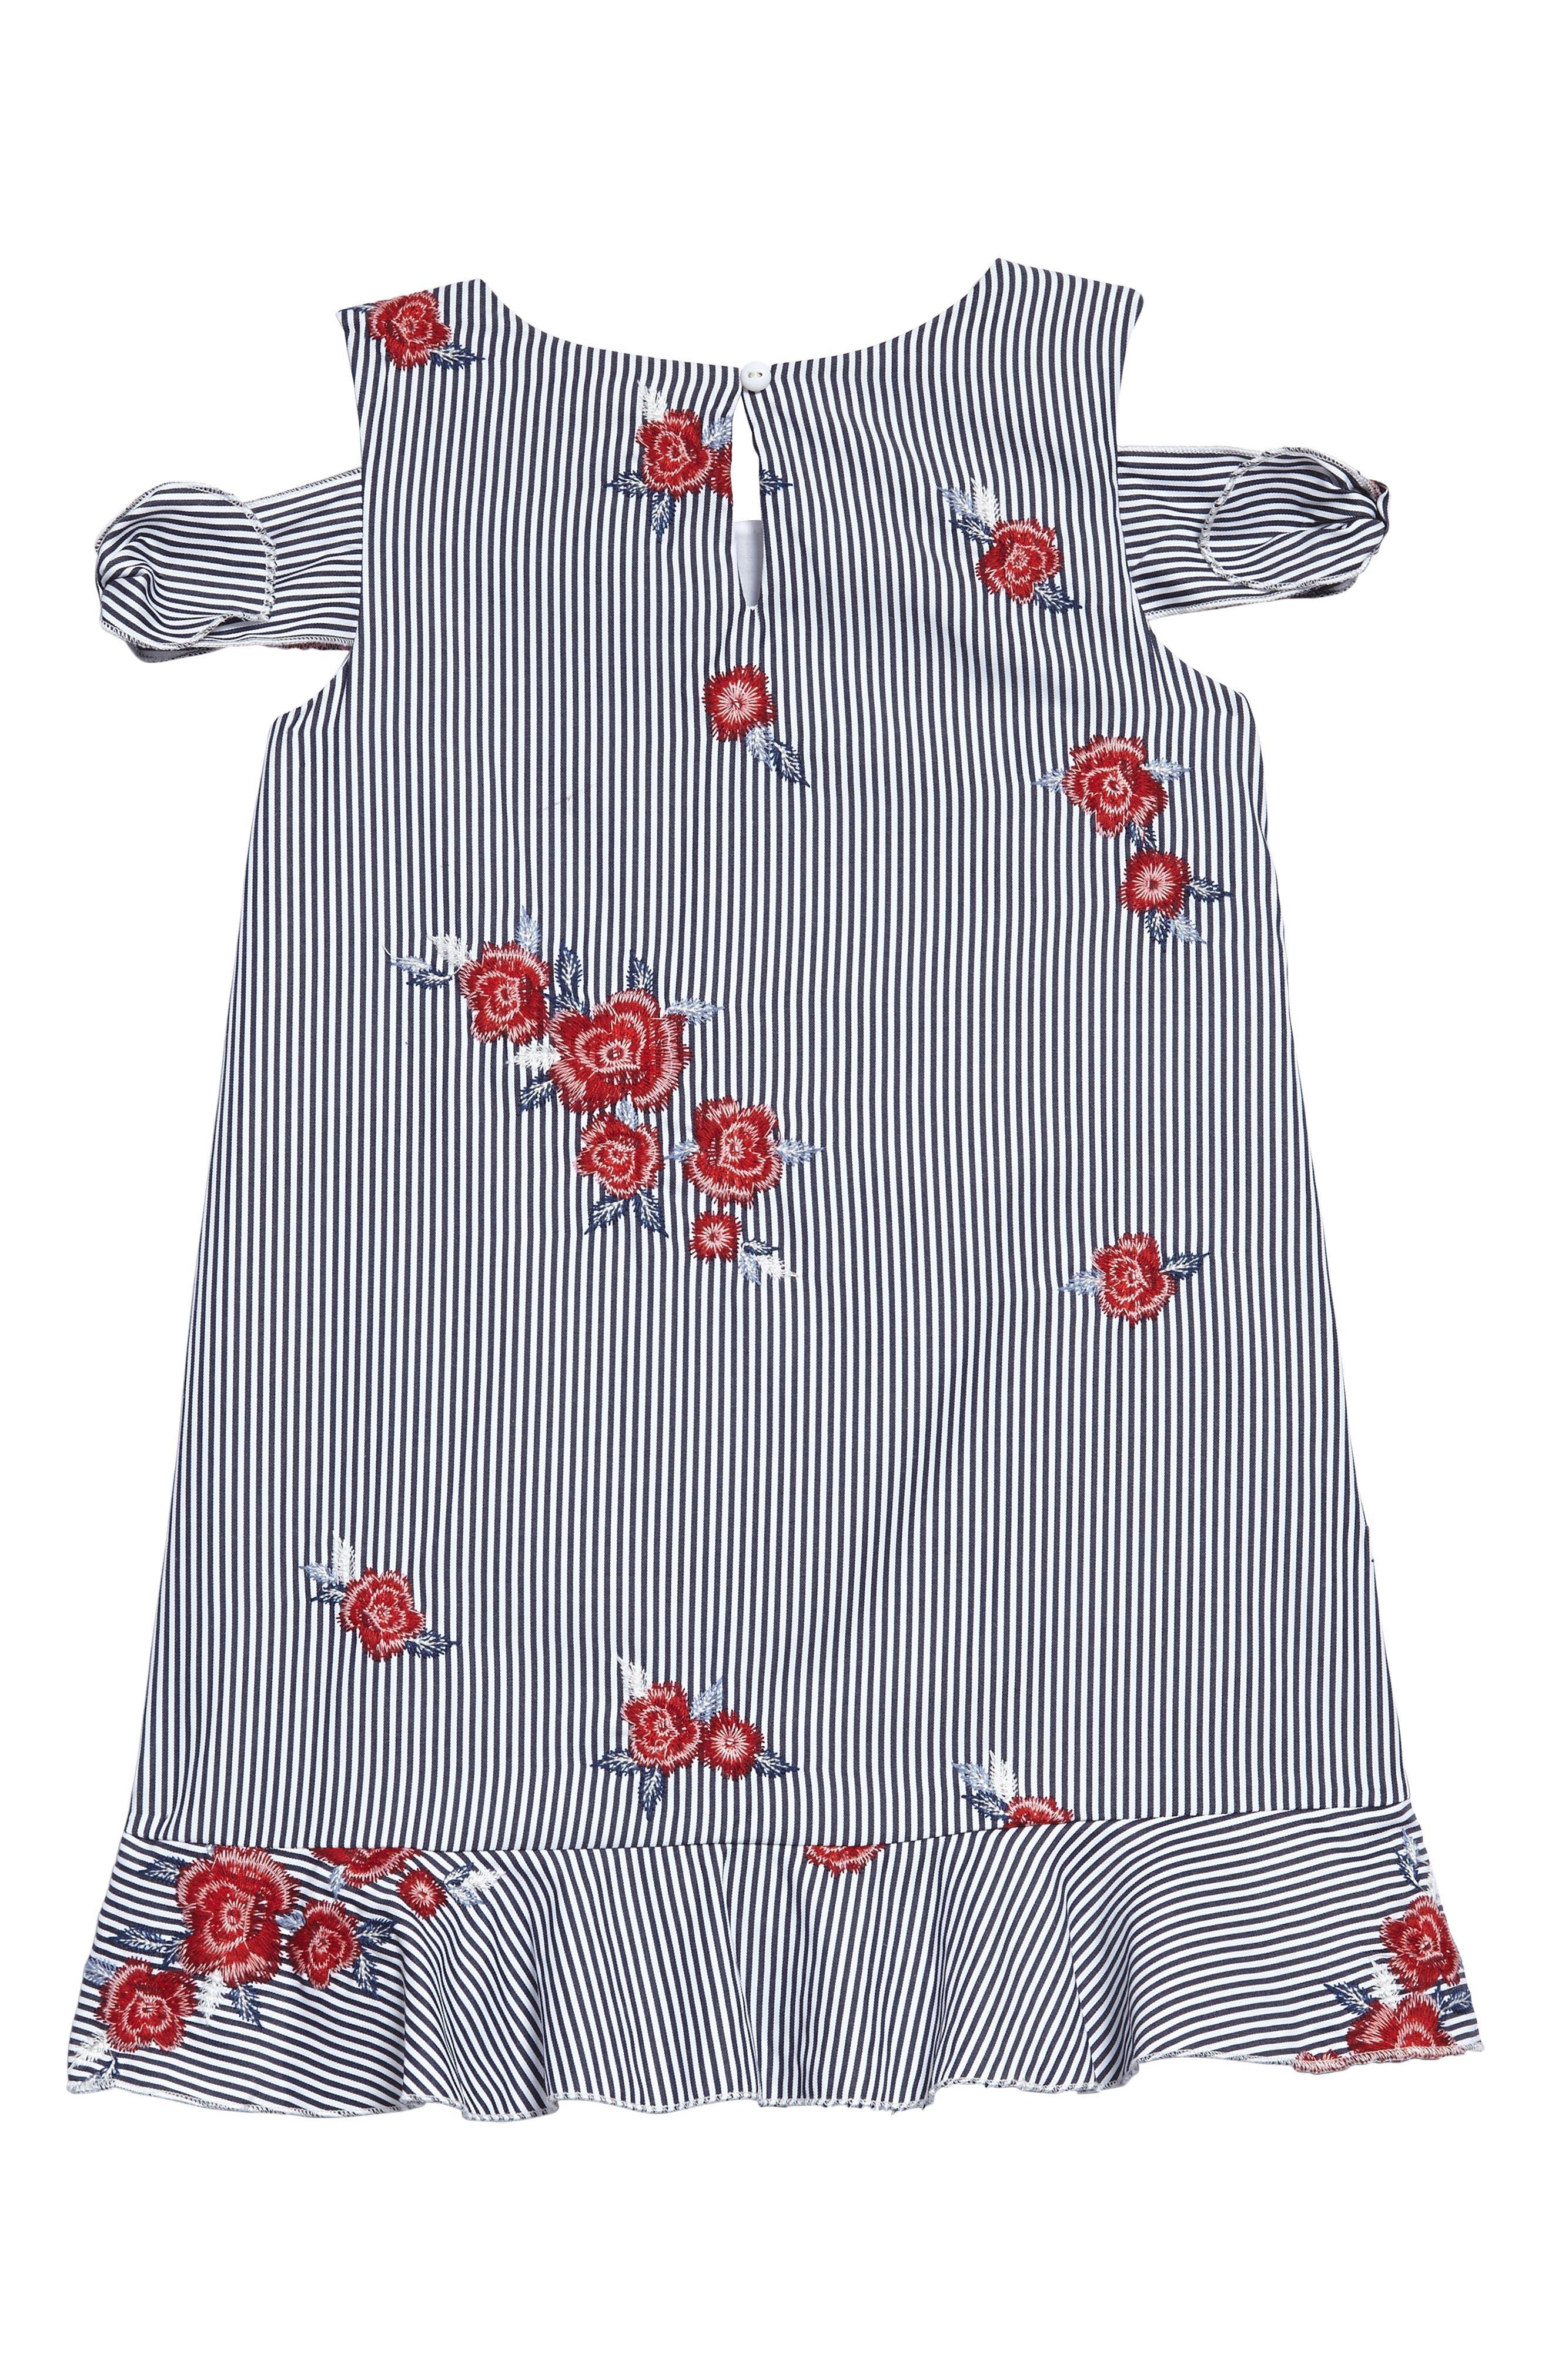 Embroidered Stripe Dress,                             Alternate thumbnail 2, color,                             Navy Multi